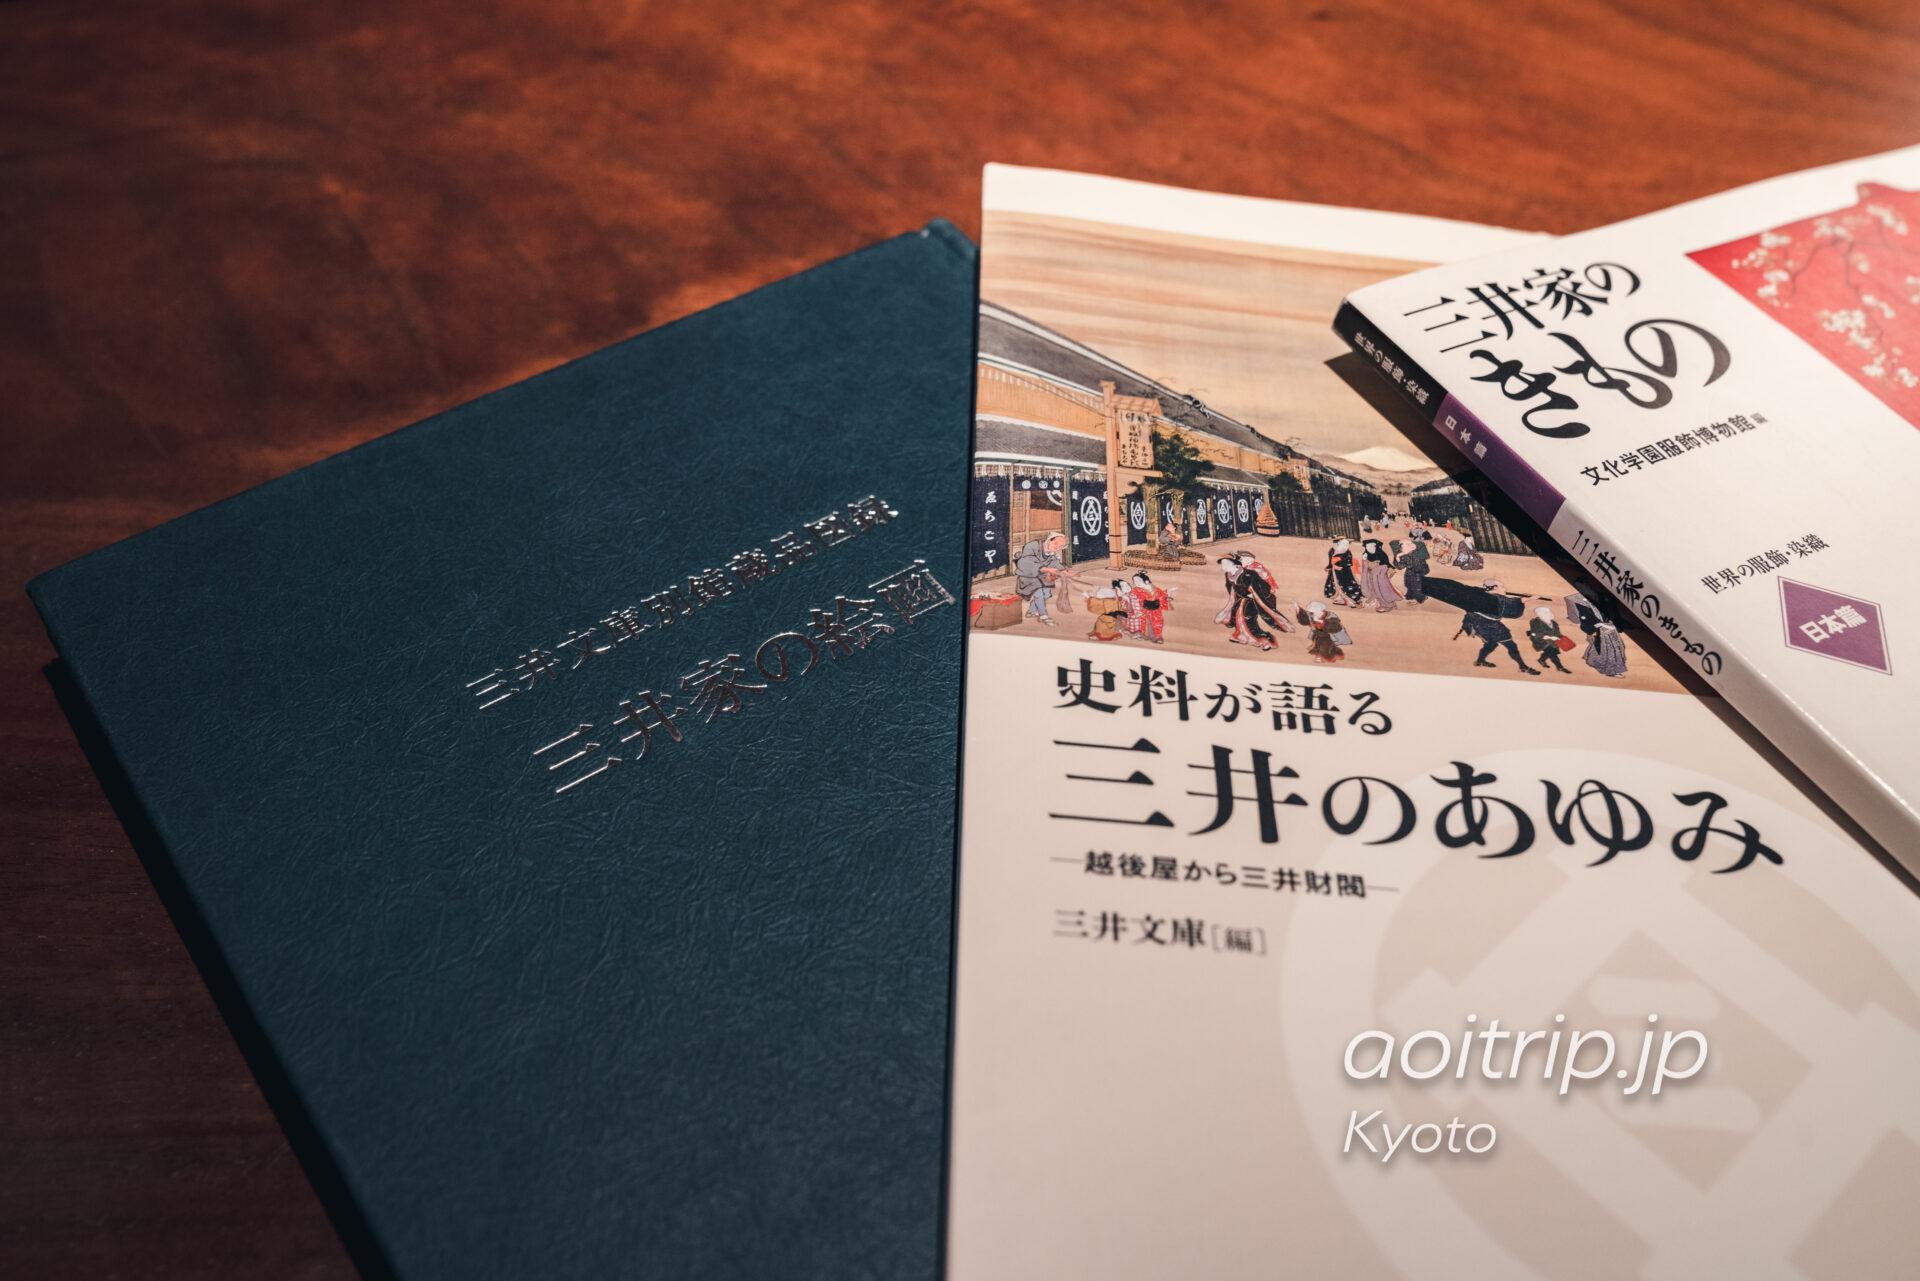 HOTEL THE MITSUI KYOTO 三井の関連書籍